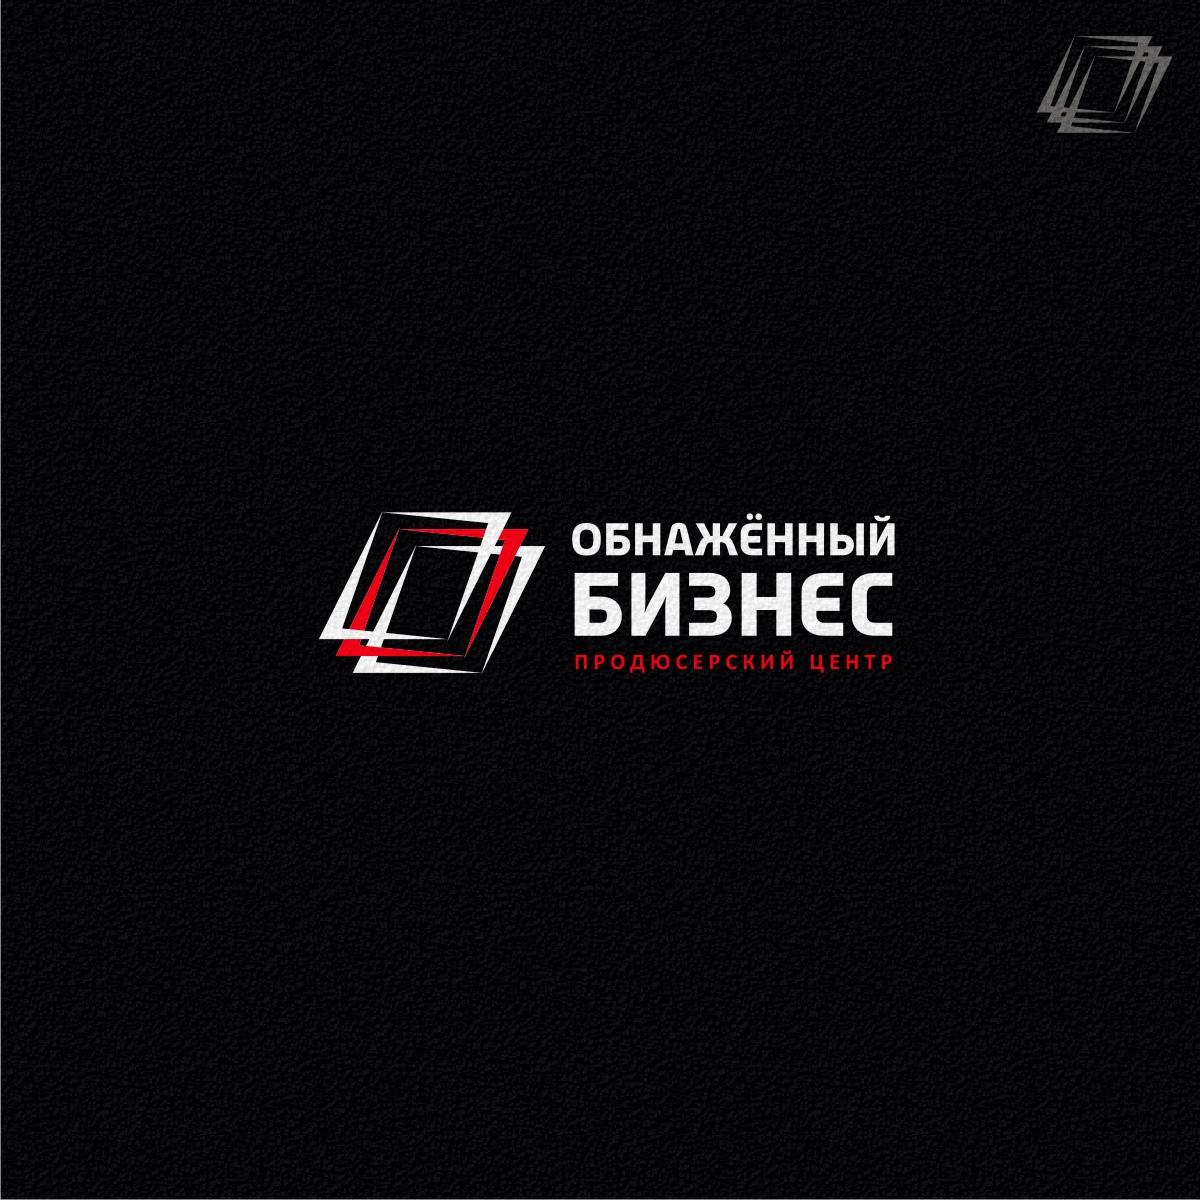 "Логотип для продюсерского центра ""Обнажённый бизнес"" фото f_2465ba4d8f541a9c.jpg"